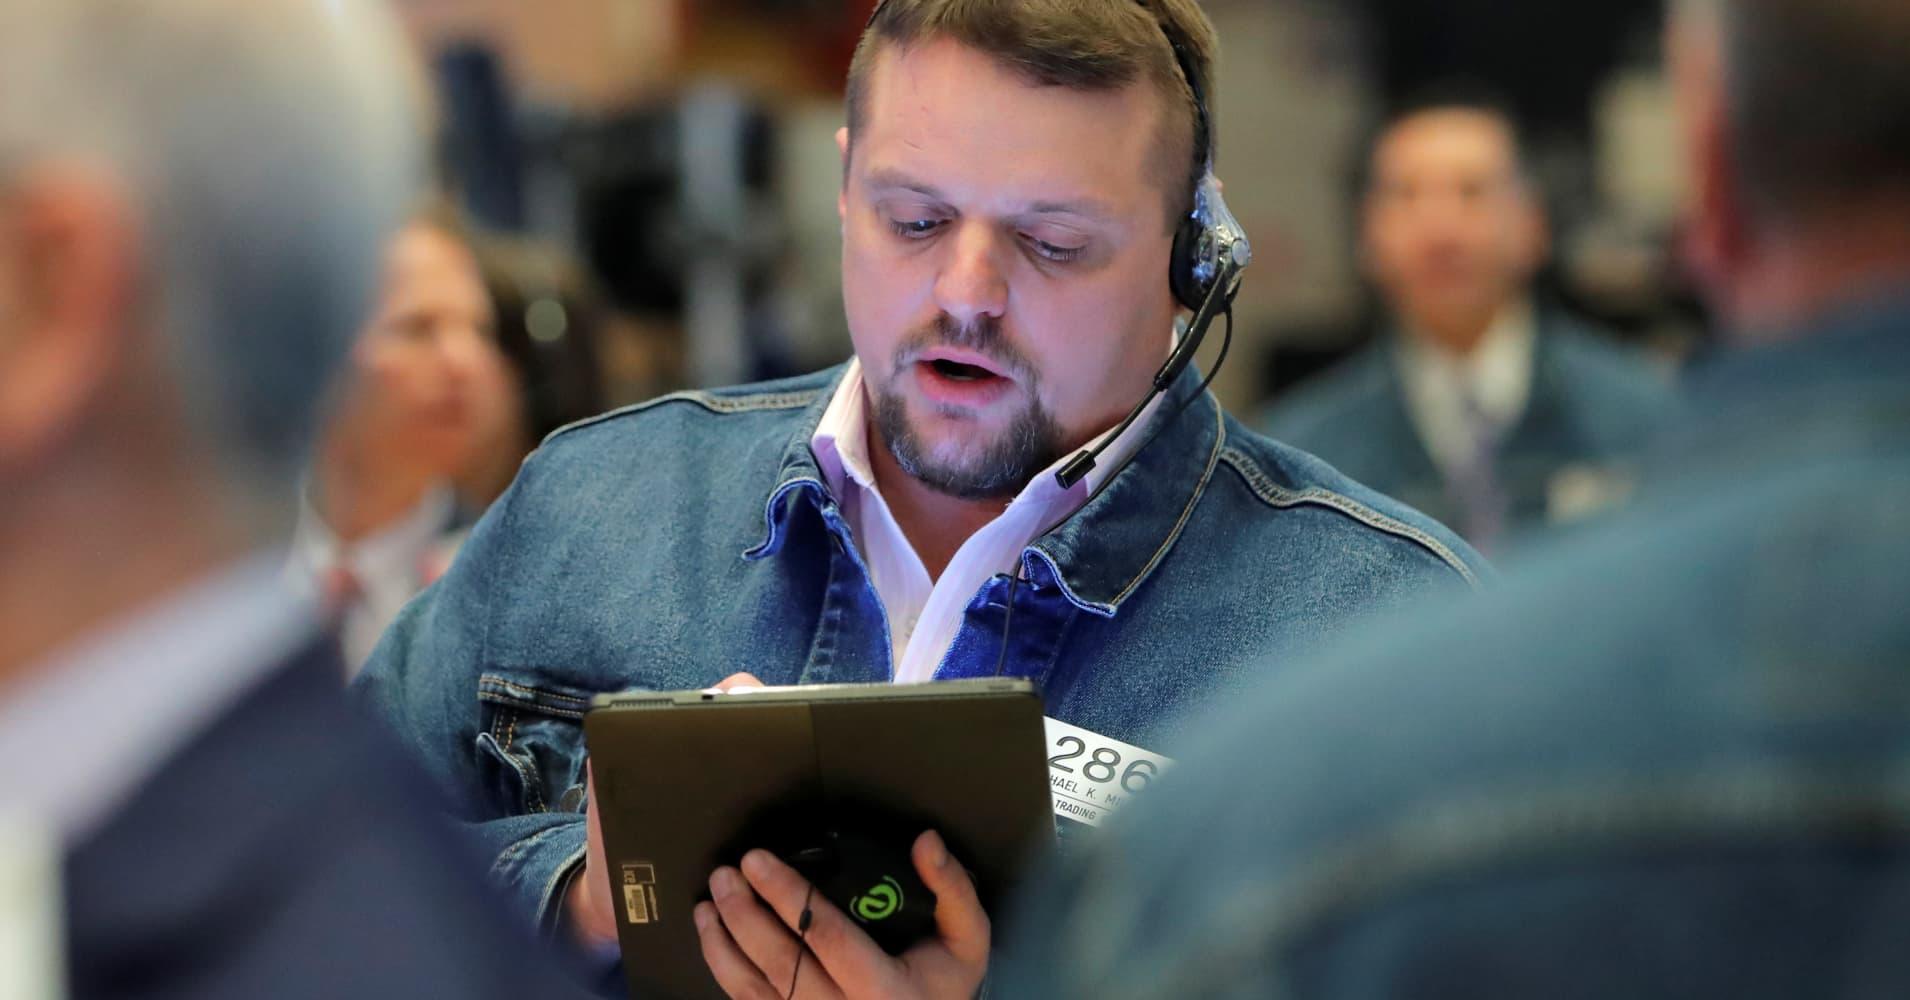 Stocks making the biggest moves premarket: Biogen, Viacom, Boeing, Deutsche Bank & more